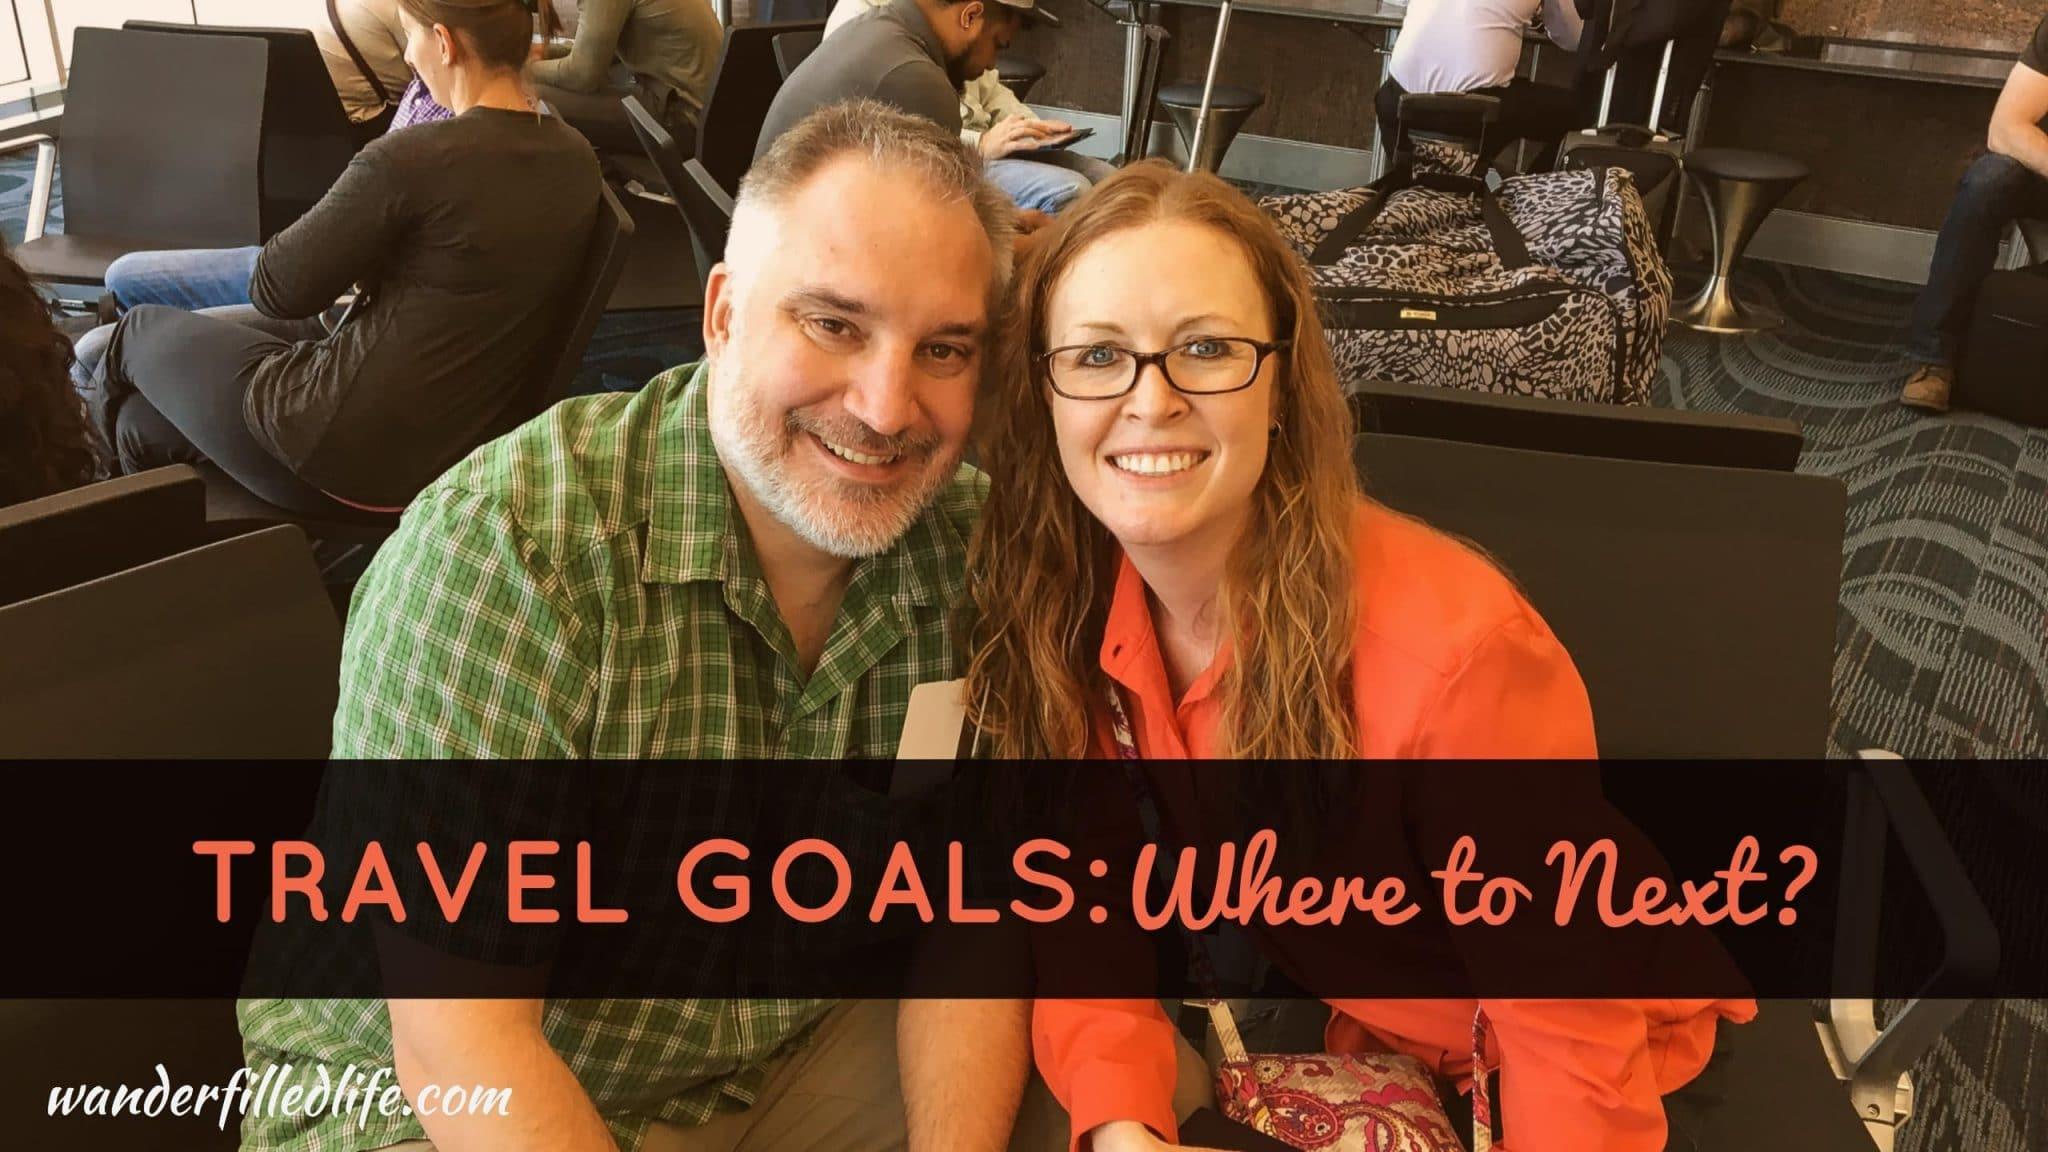 Travel Goals: Where to Next?